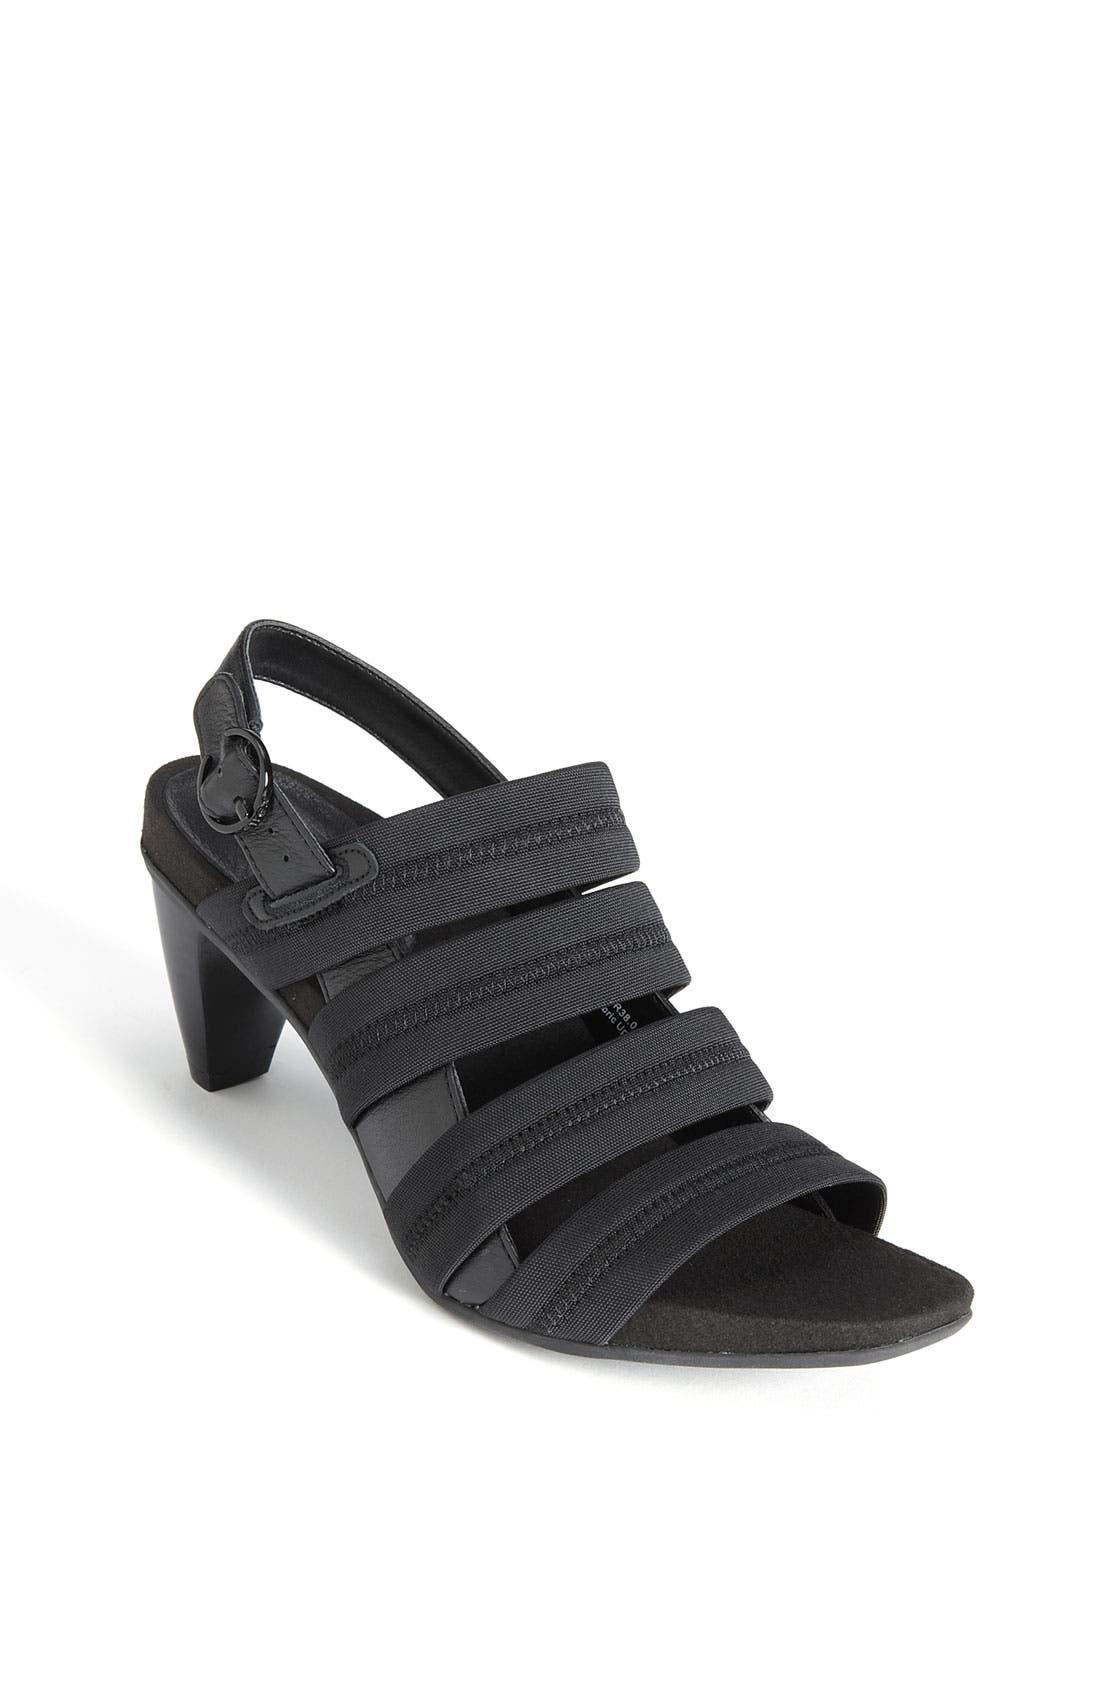 Alternate Image 1 Selected - Aetrex 'Veronica' Sandal